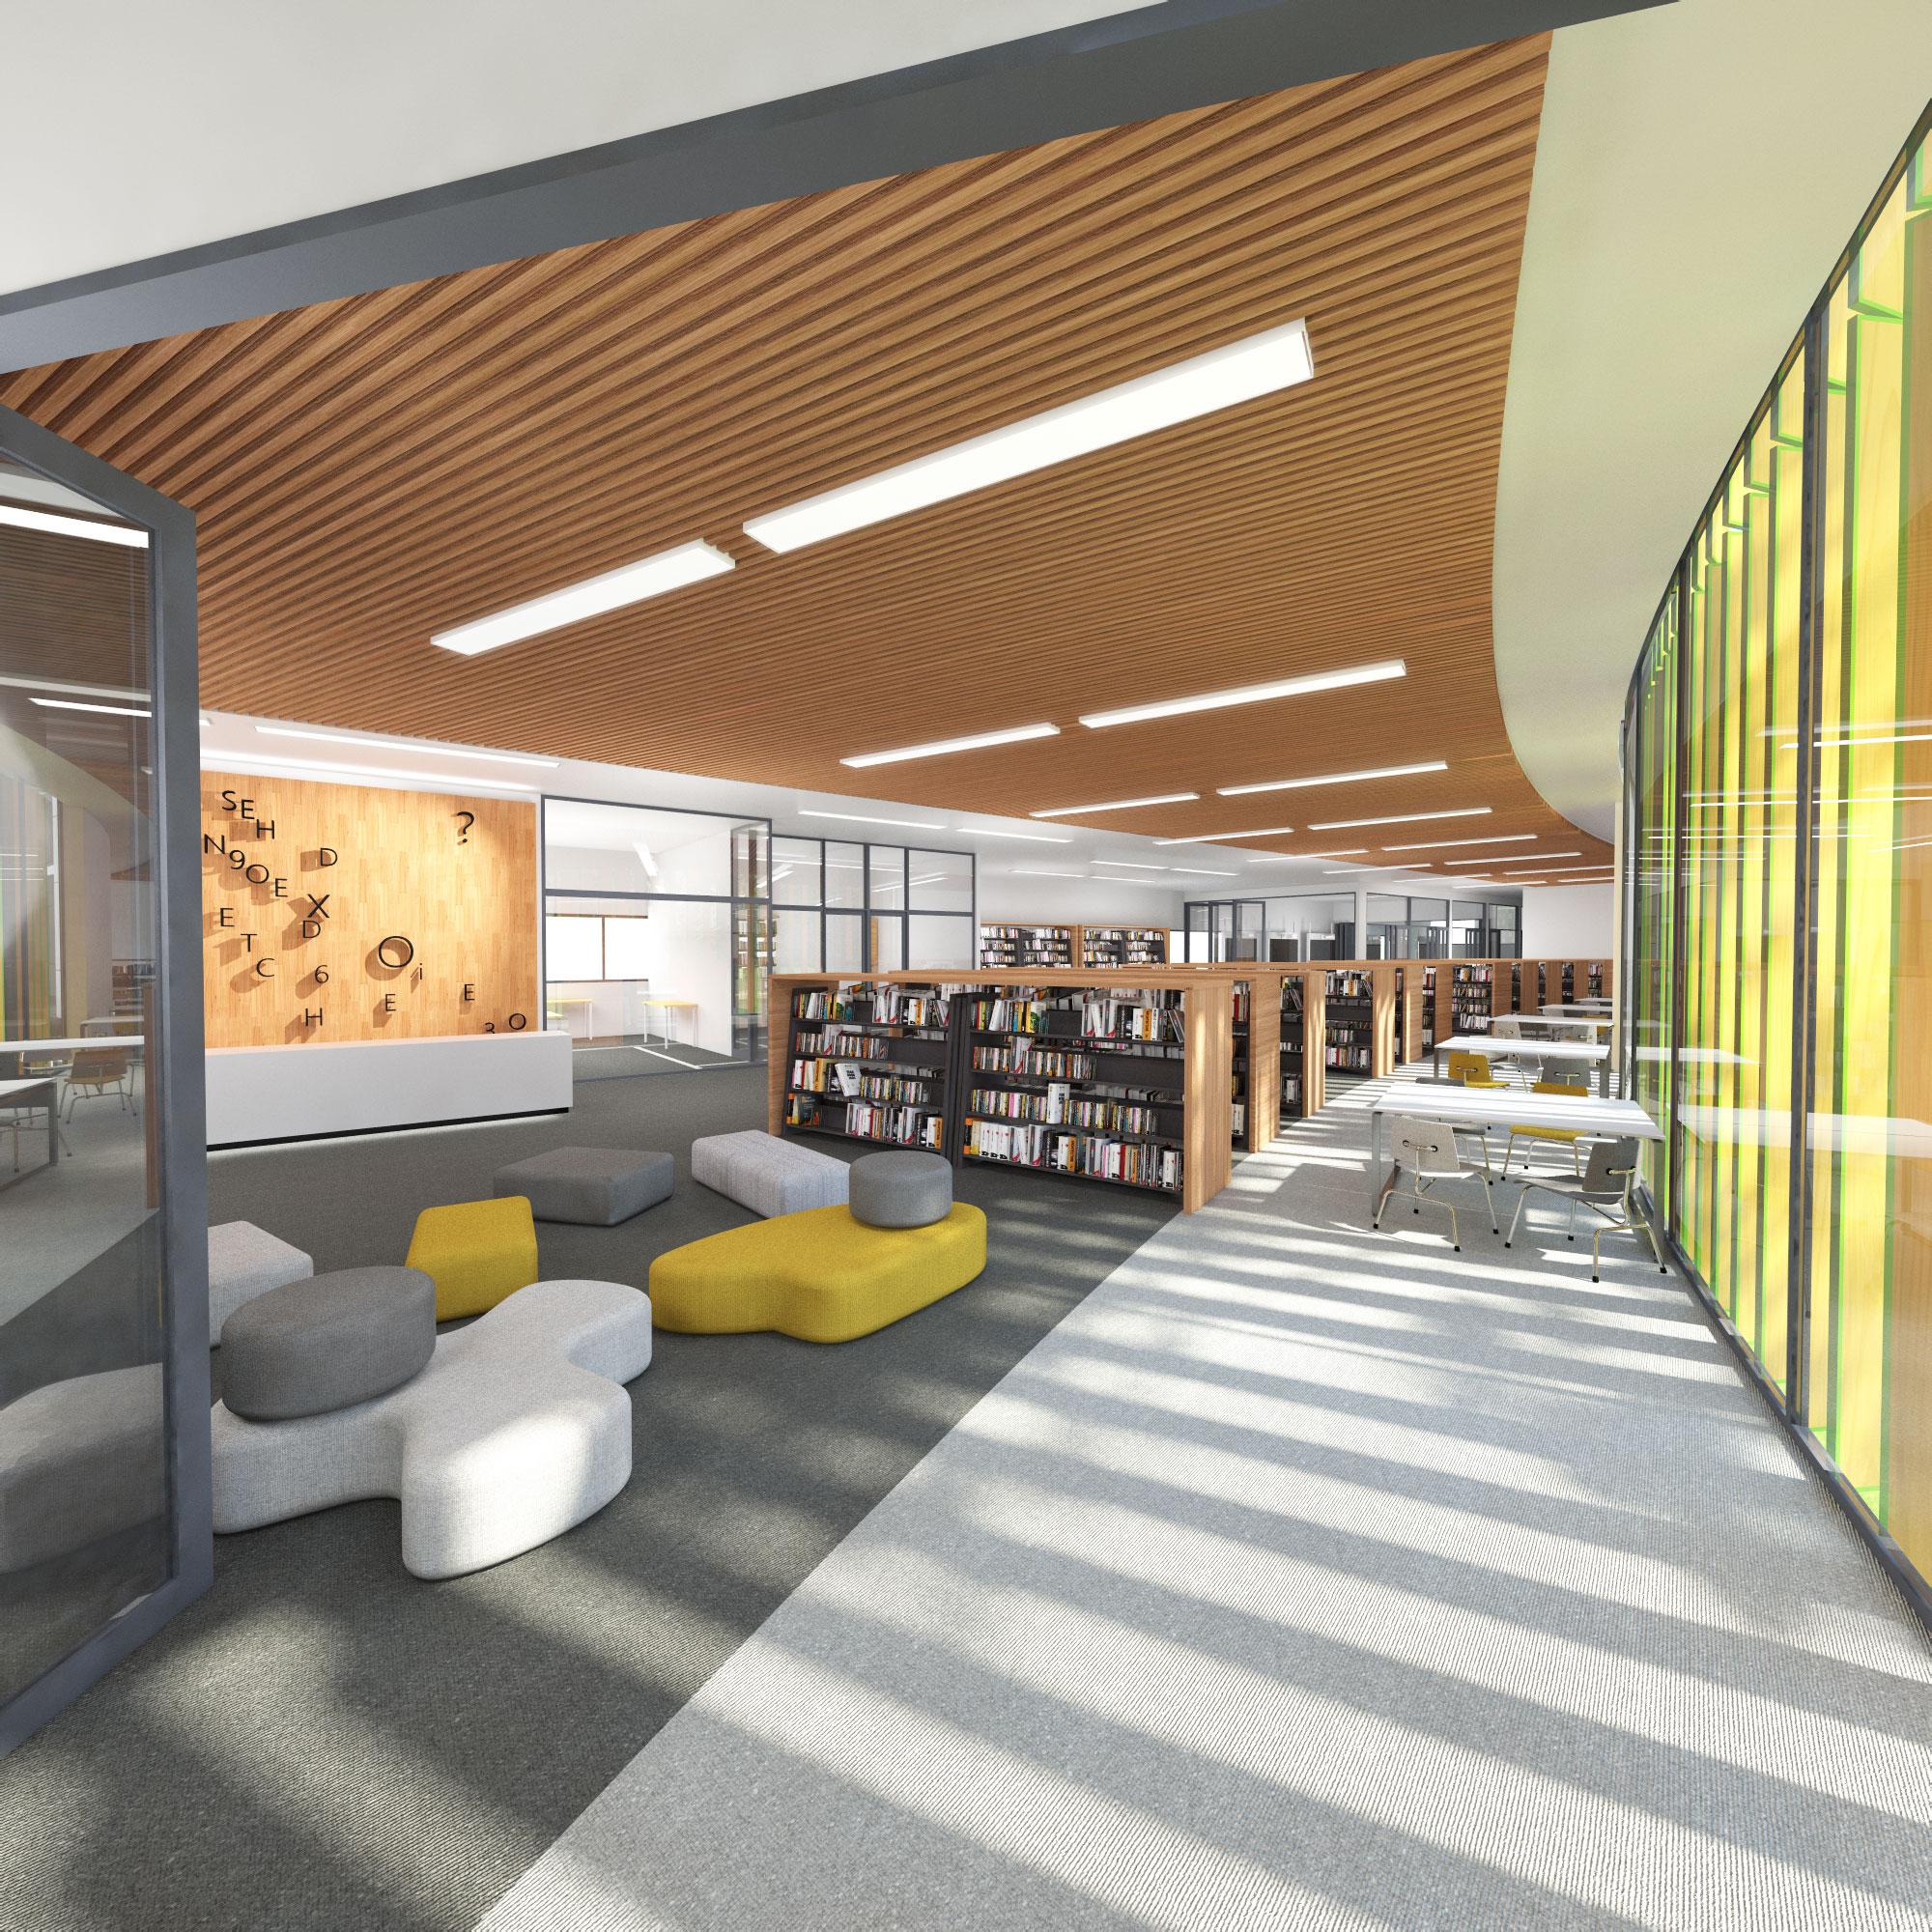 Moriah College Master Plan 3D Render of Interior Architecture – Gardner Wetherill GW 3